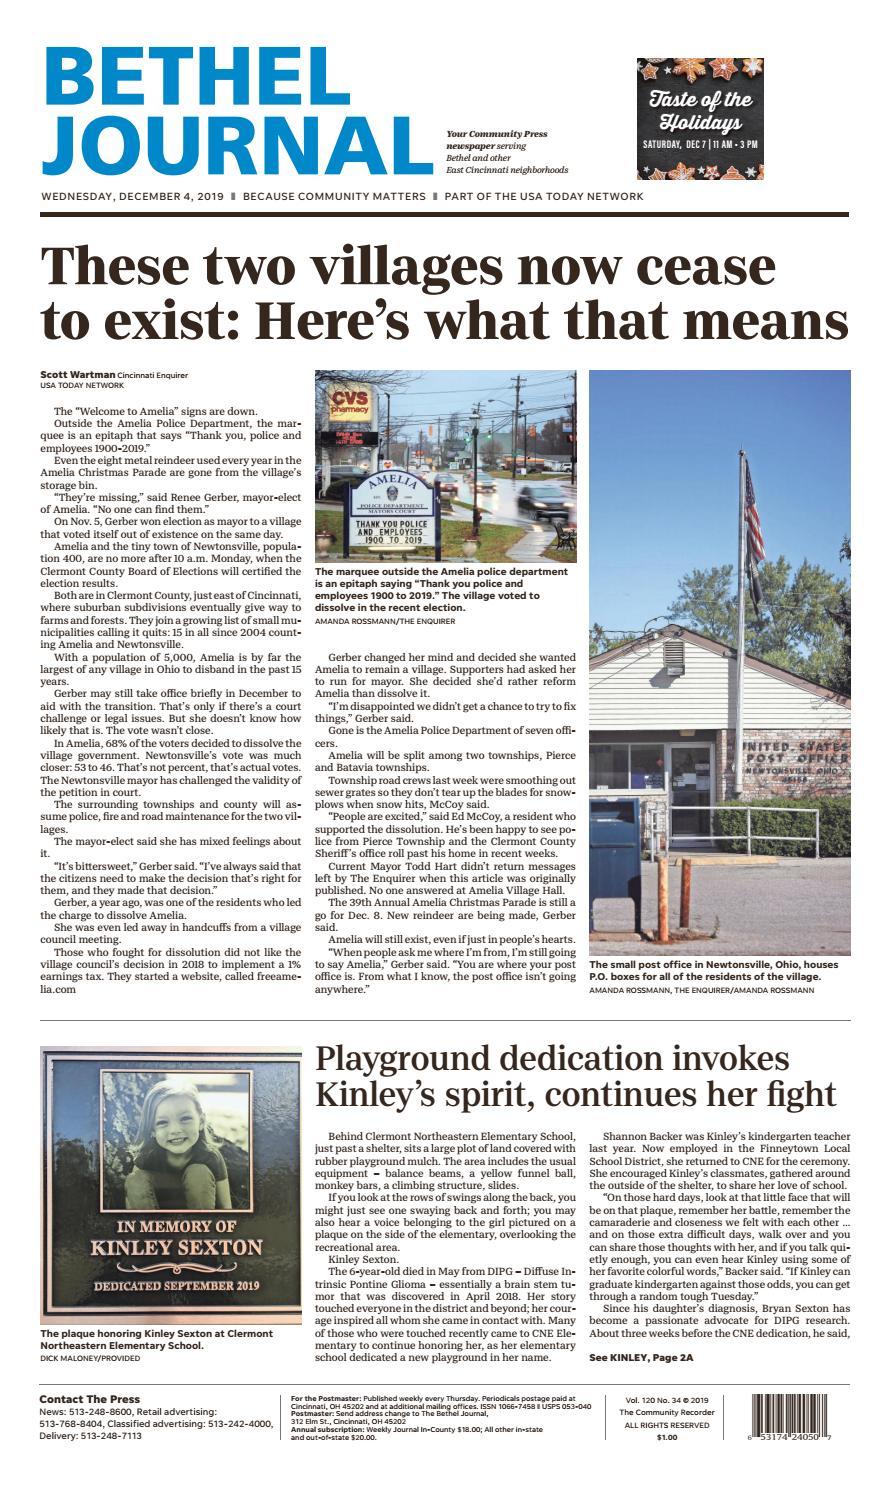 Bethel Journal 12 04 19 By Enquirer Media Issuu